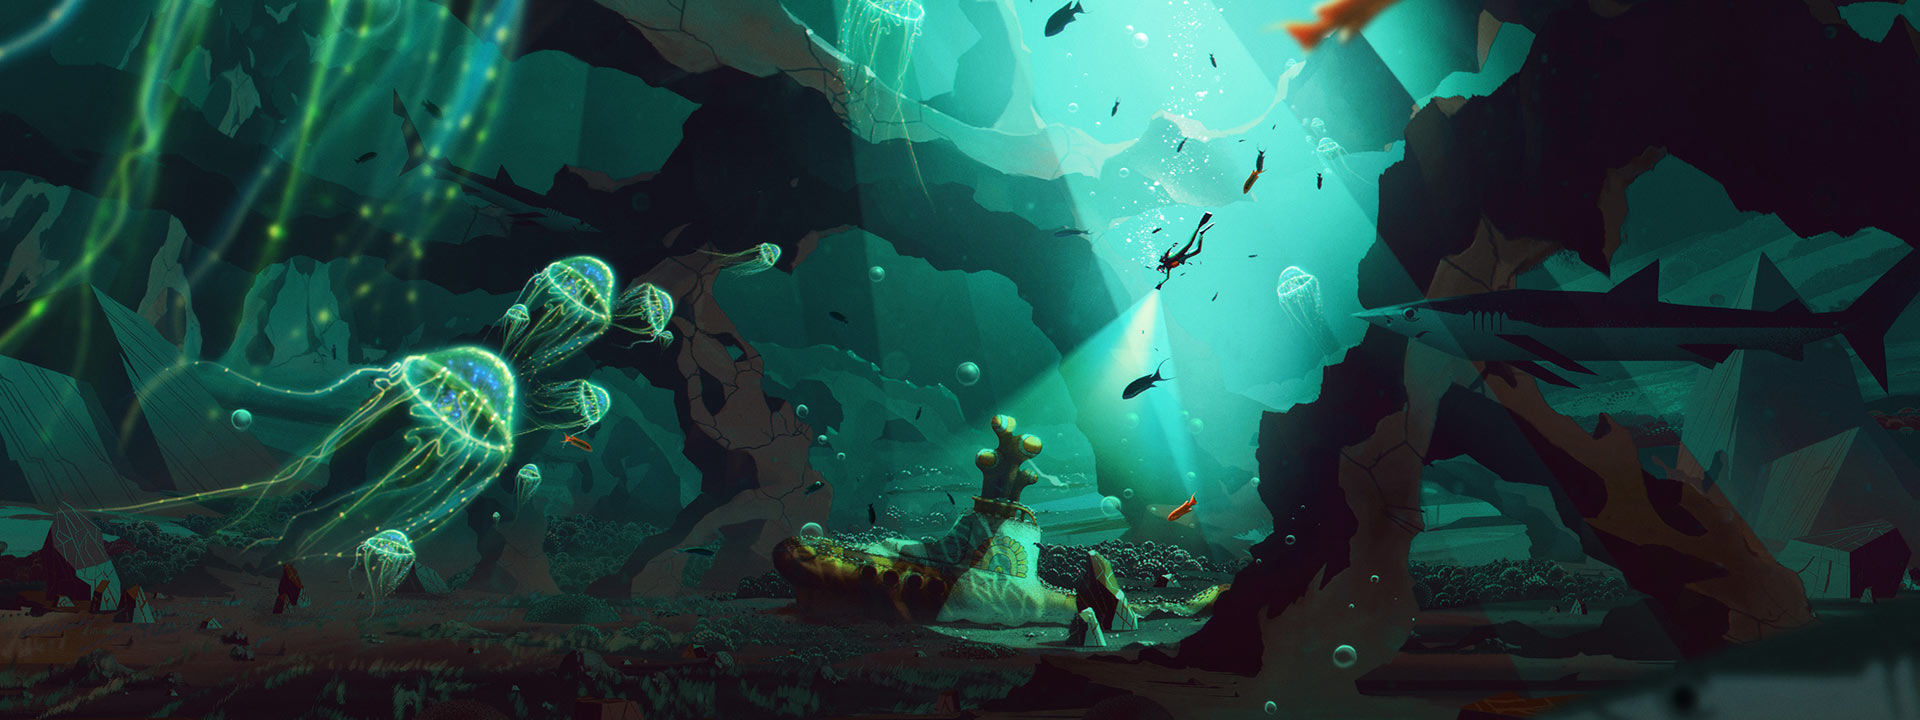 Life aquatic with Yellow Submarine